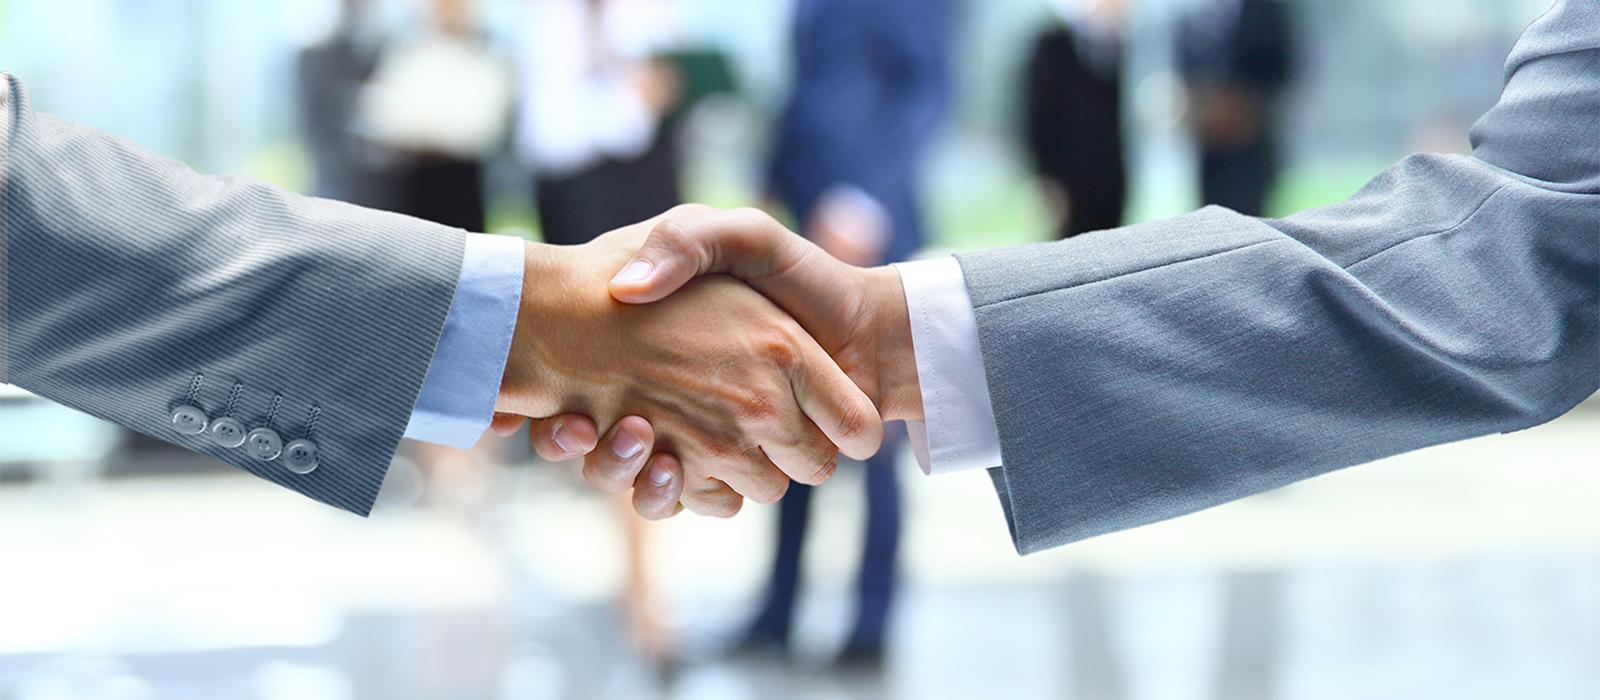 Партнерство сотрудничество